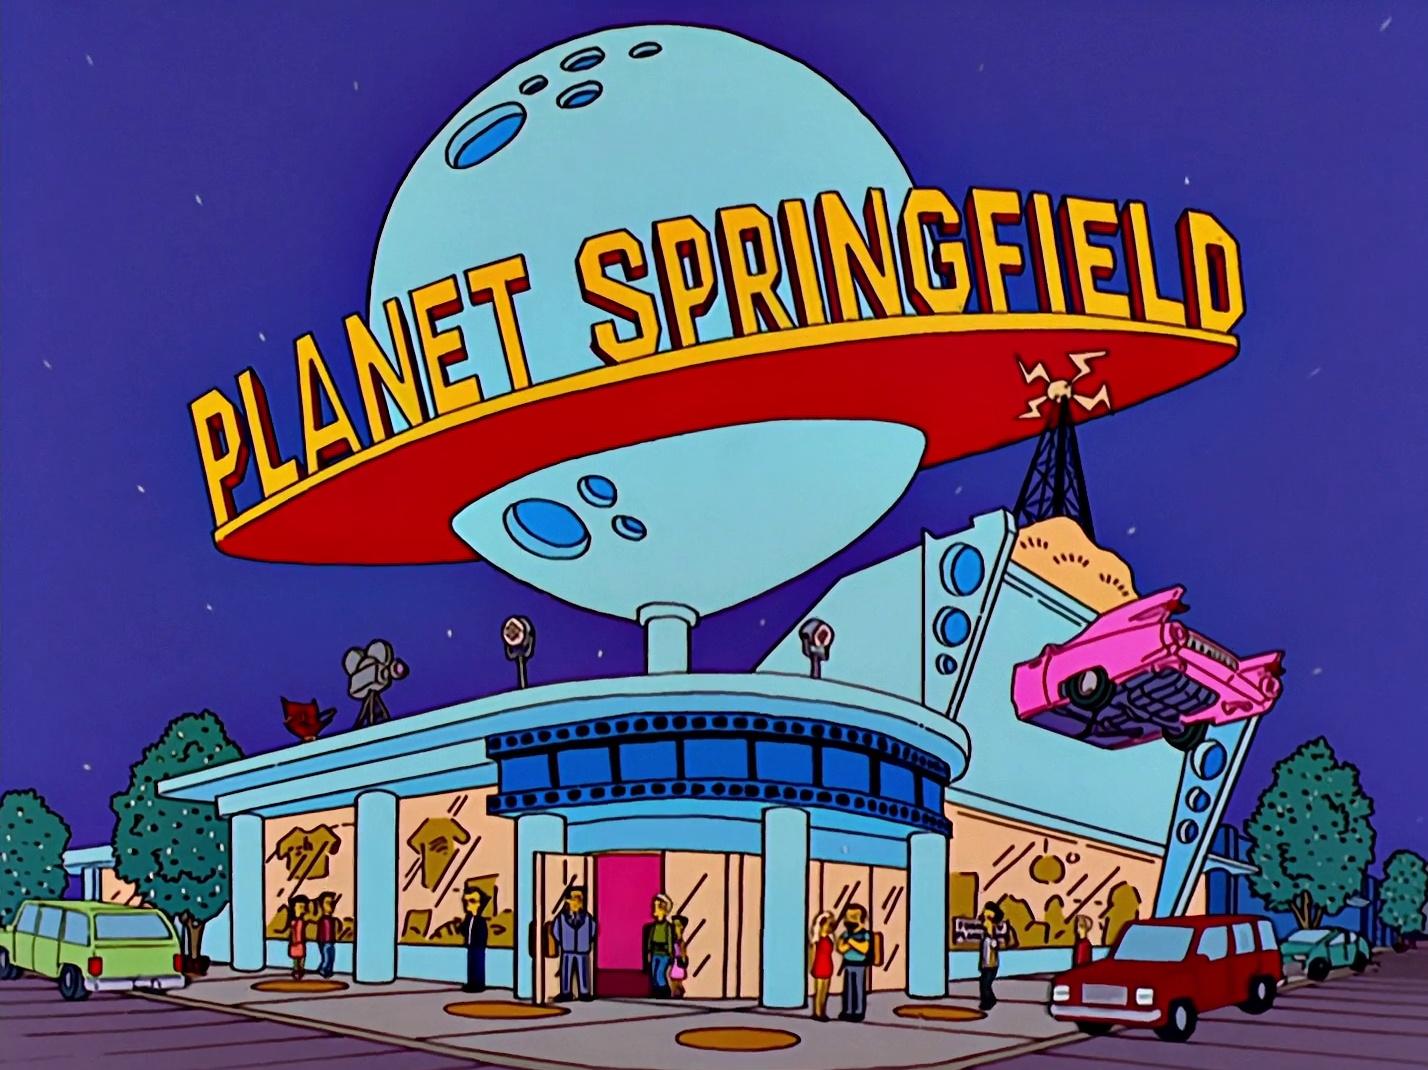 Planet Springfield